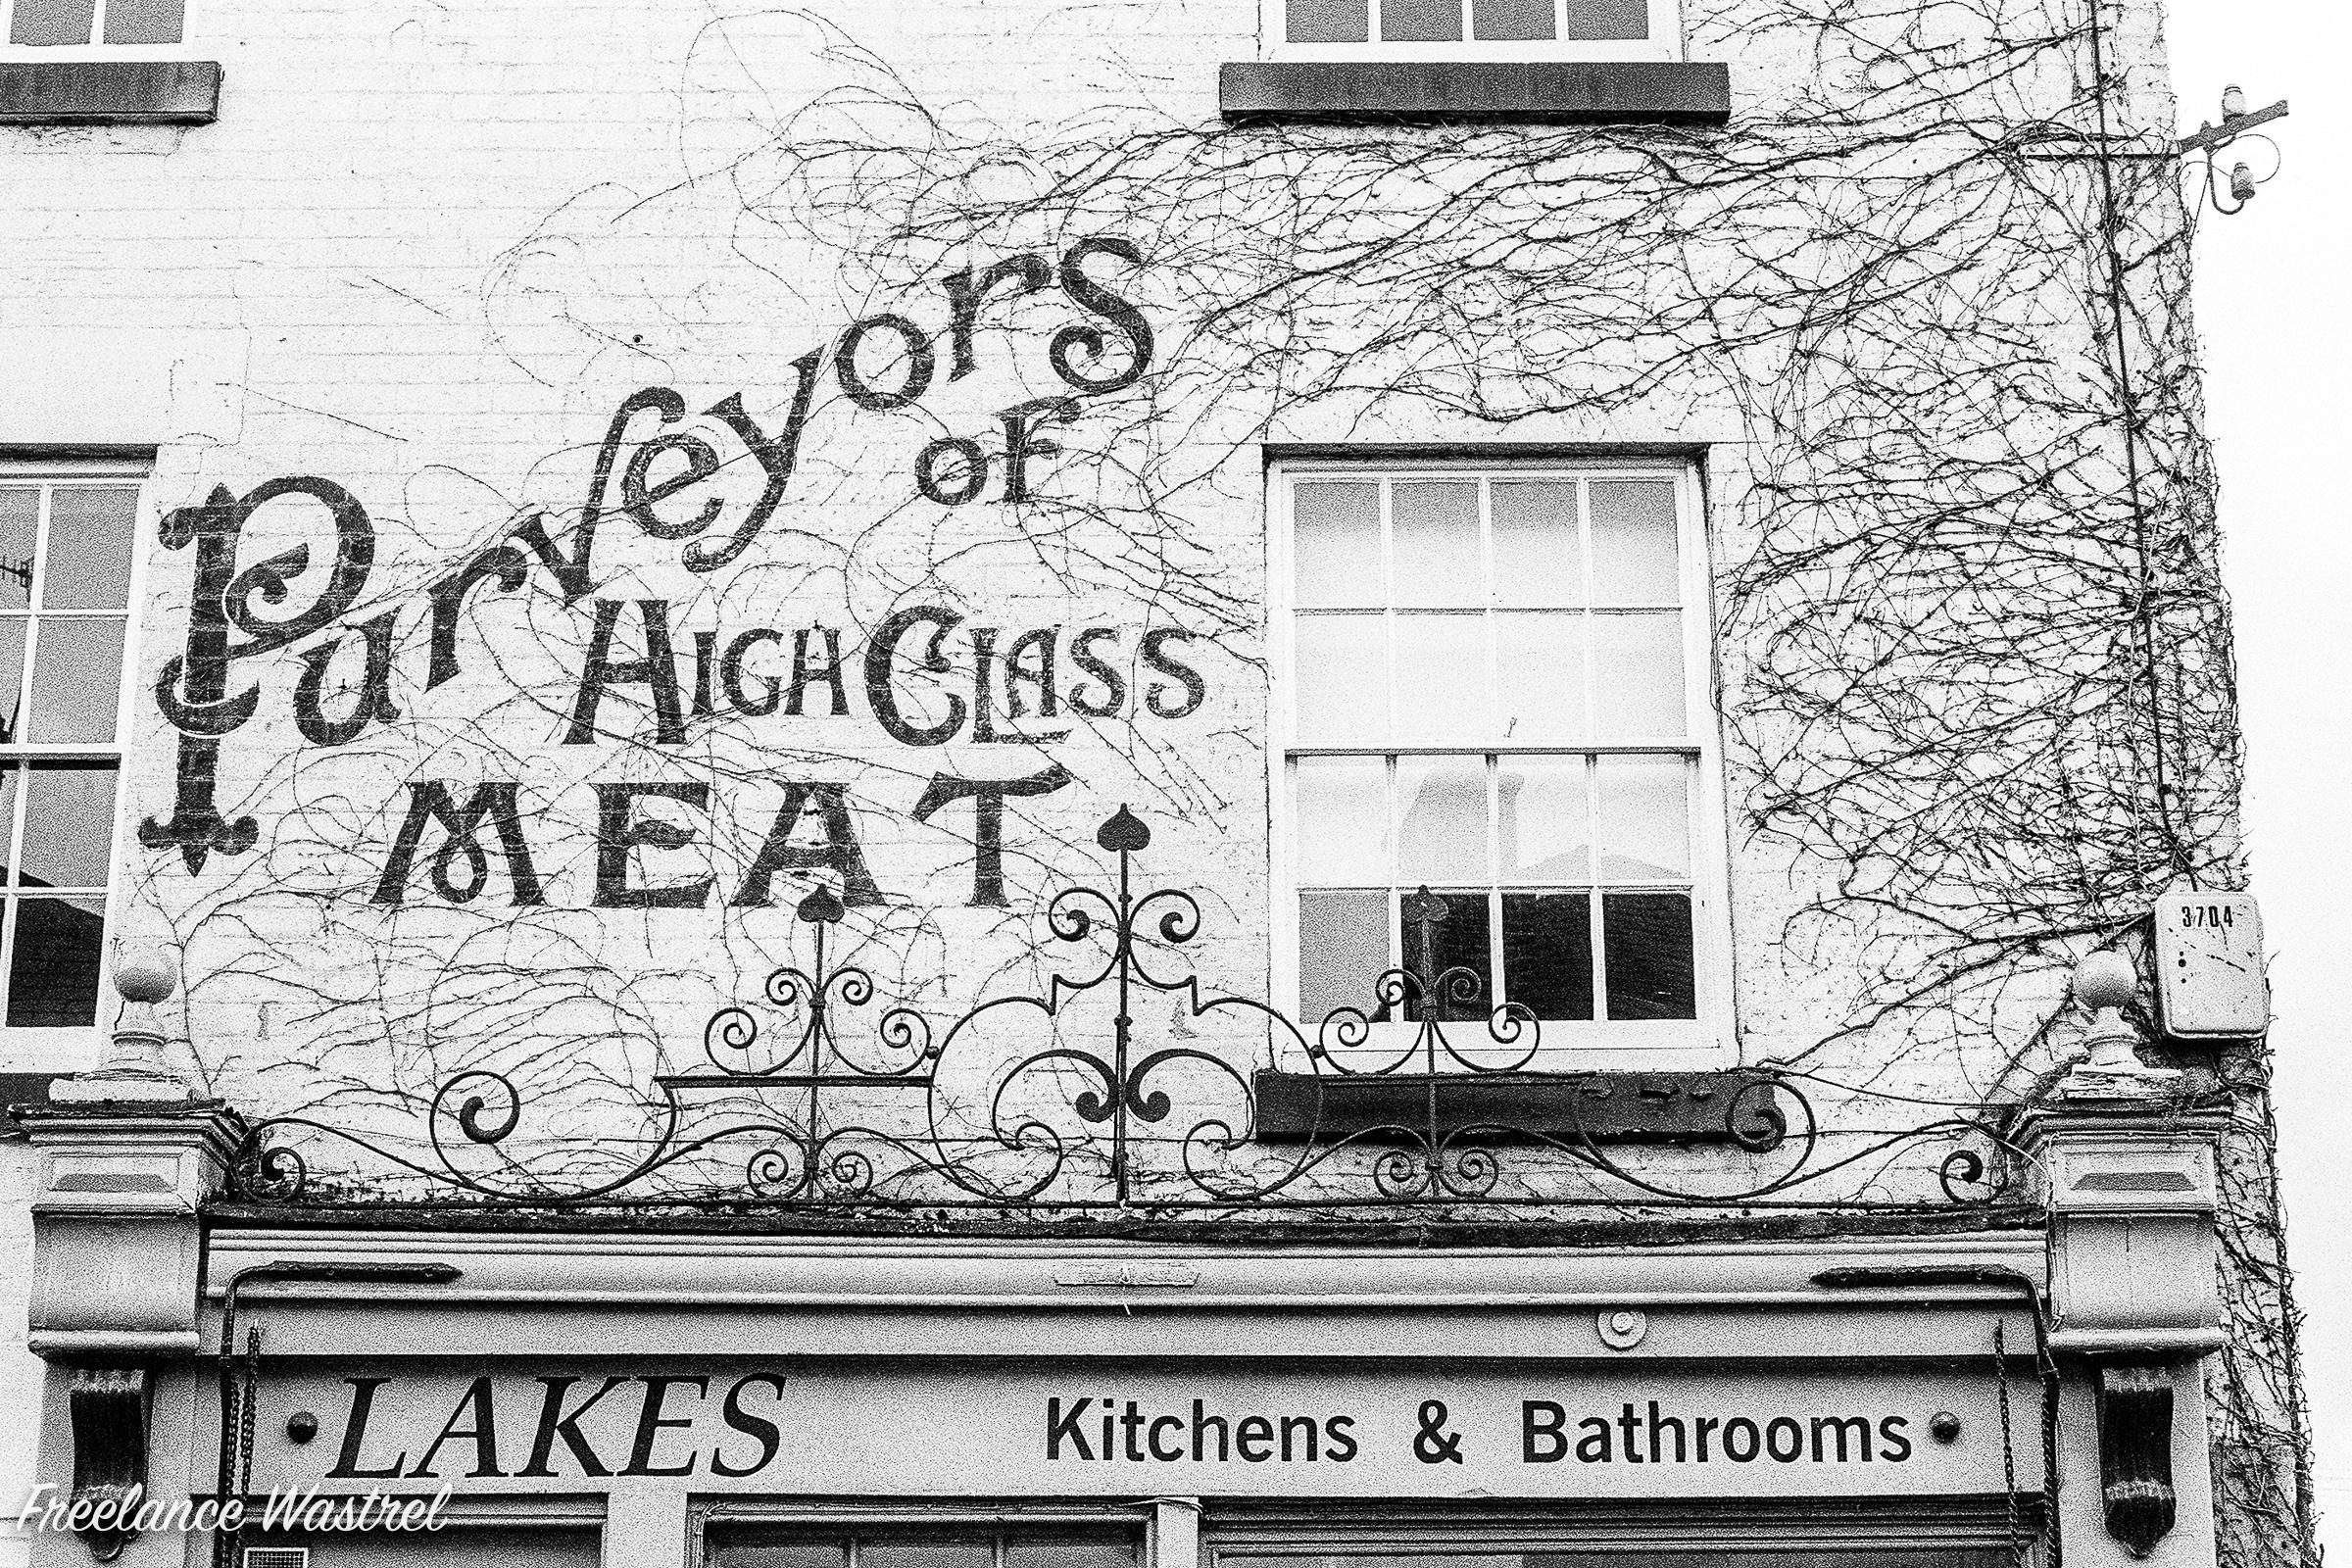 Purveyors of High Class Meat